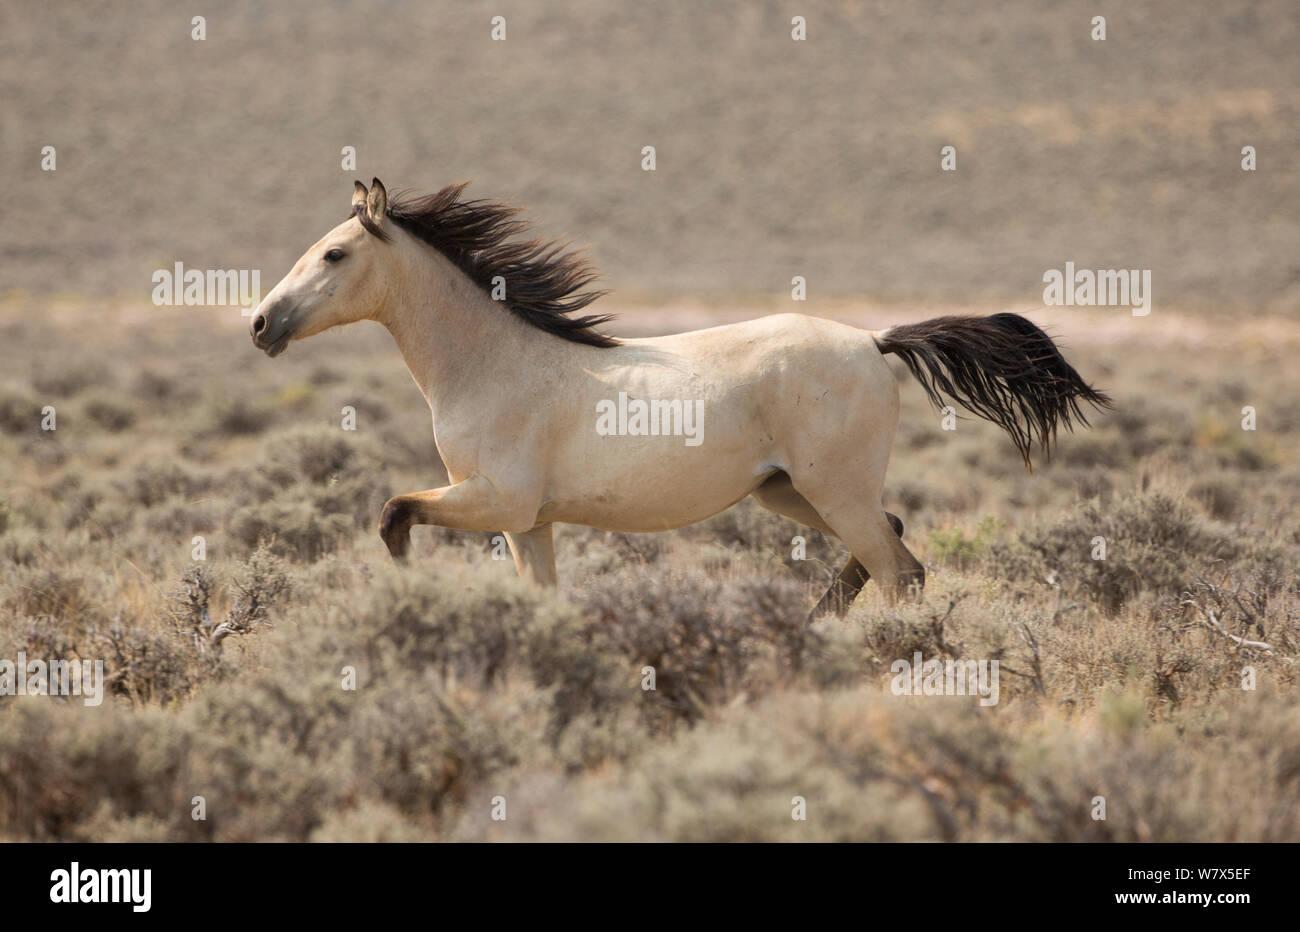 Wild Mustang Dun Horse Running Near Adobe Town Wyoming Usa Stock Photo Alamy